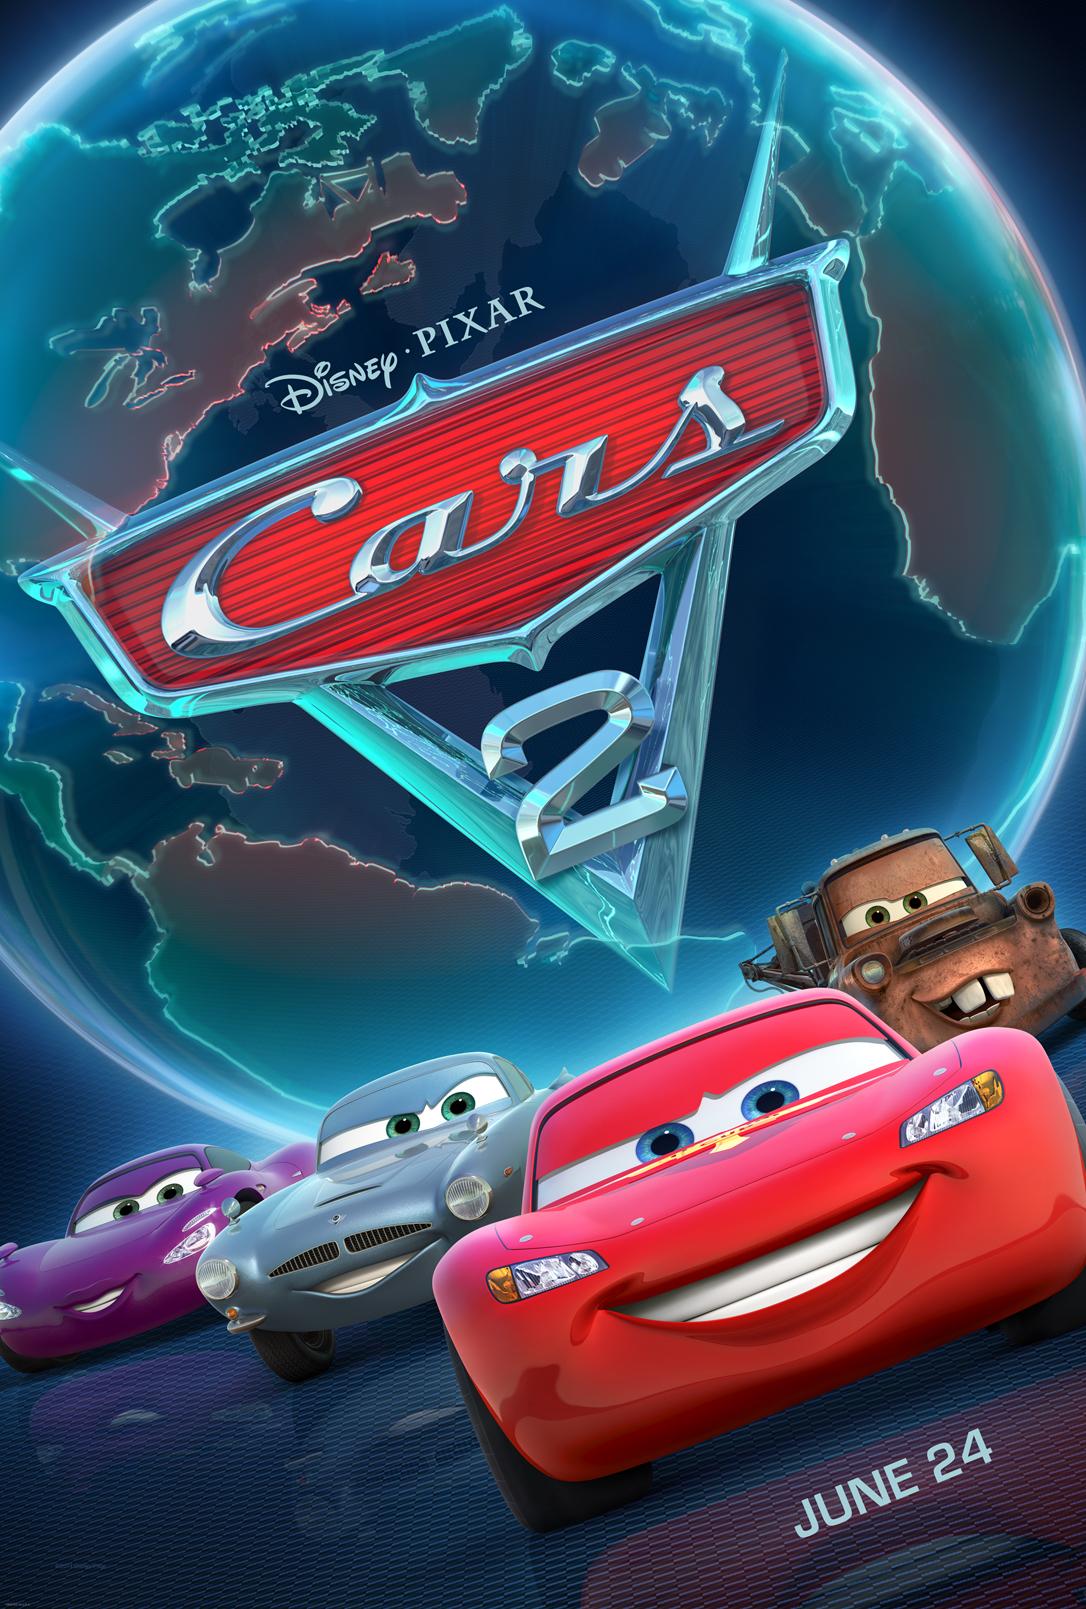 Bestand:Cars 2.jpg